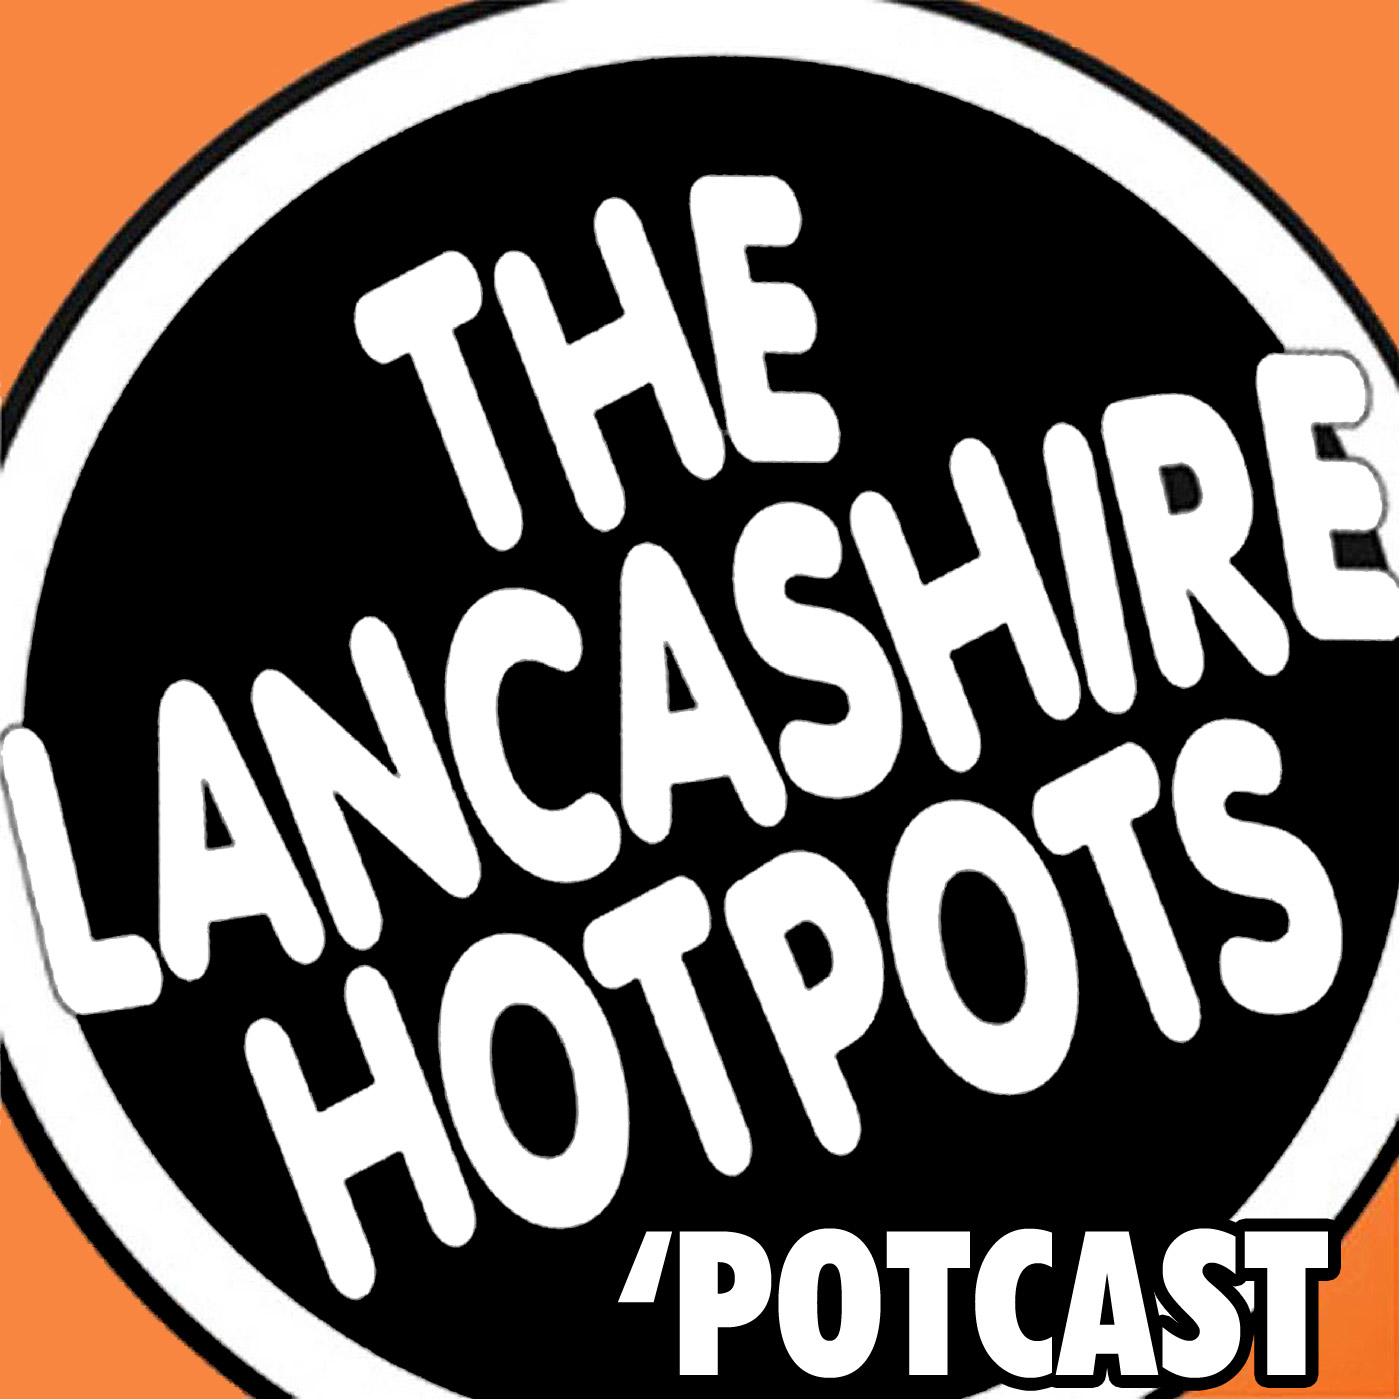 The Lancashire Hotpots December 2015 Potcast